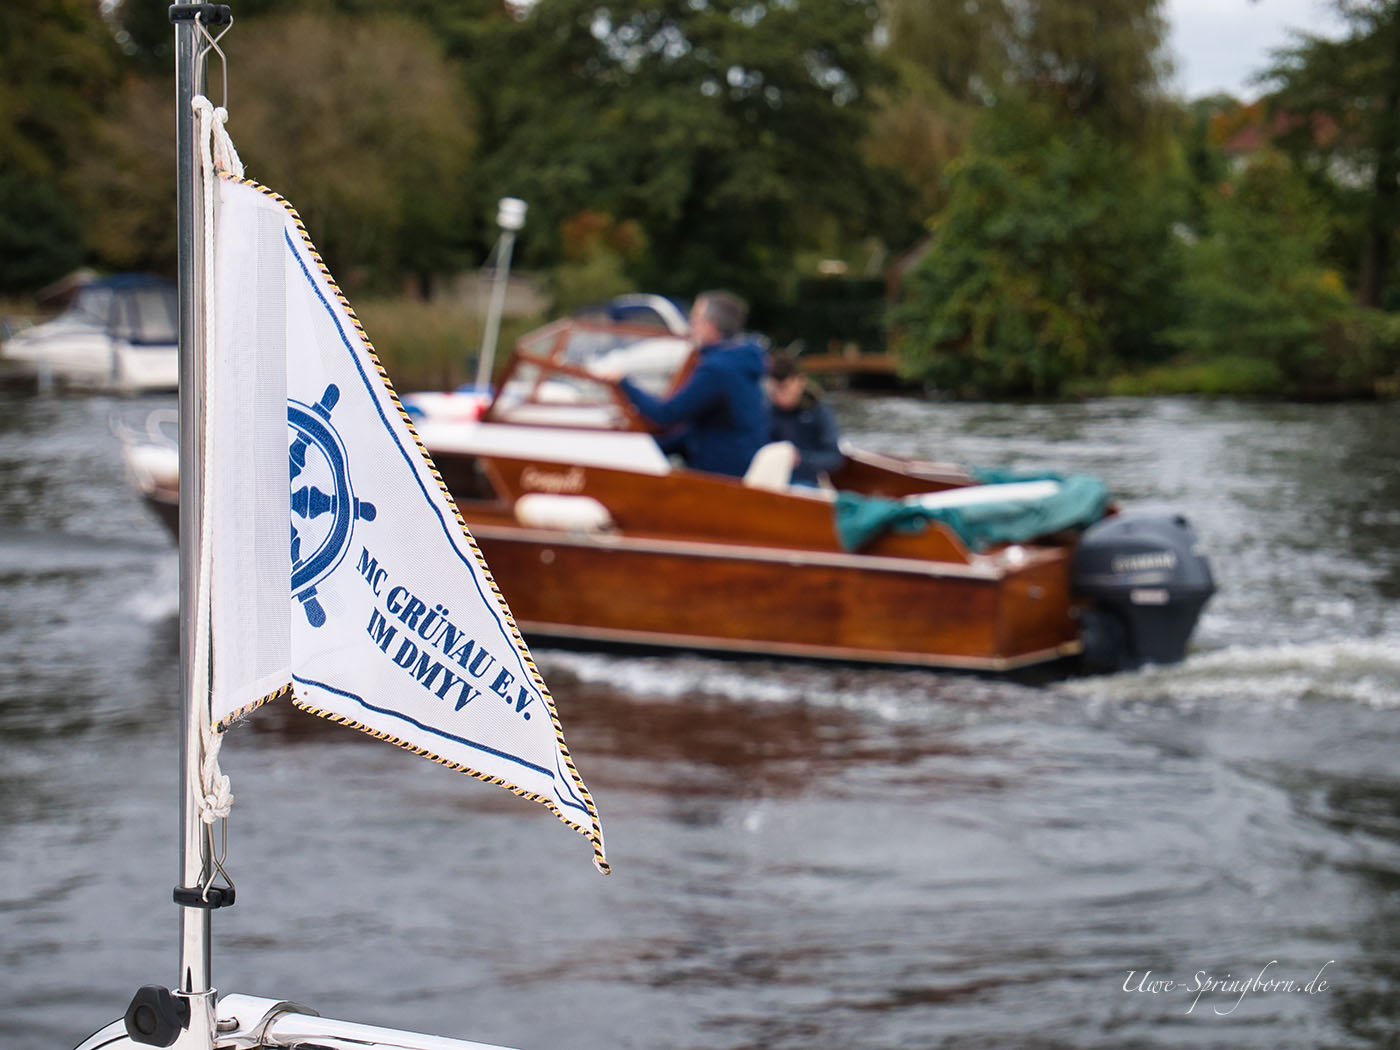 MCG-Wimpel mit Boot